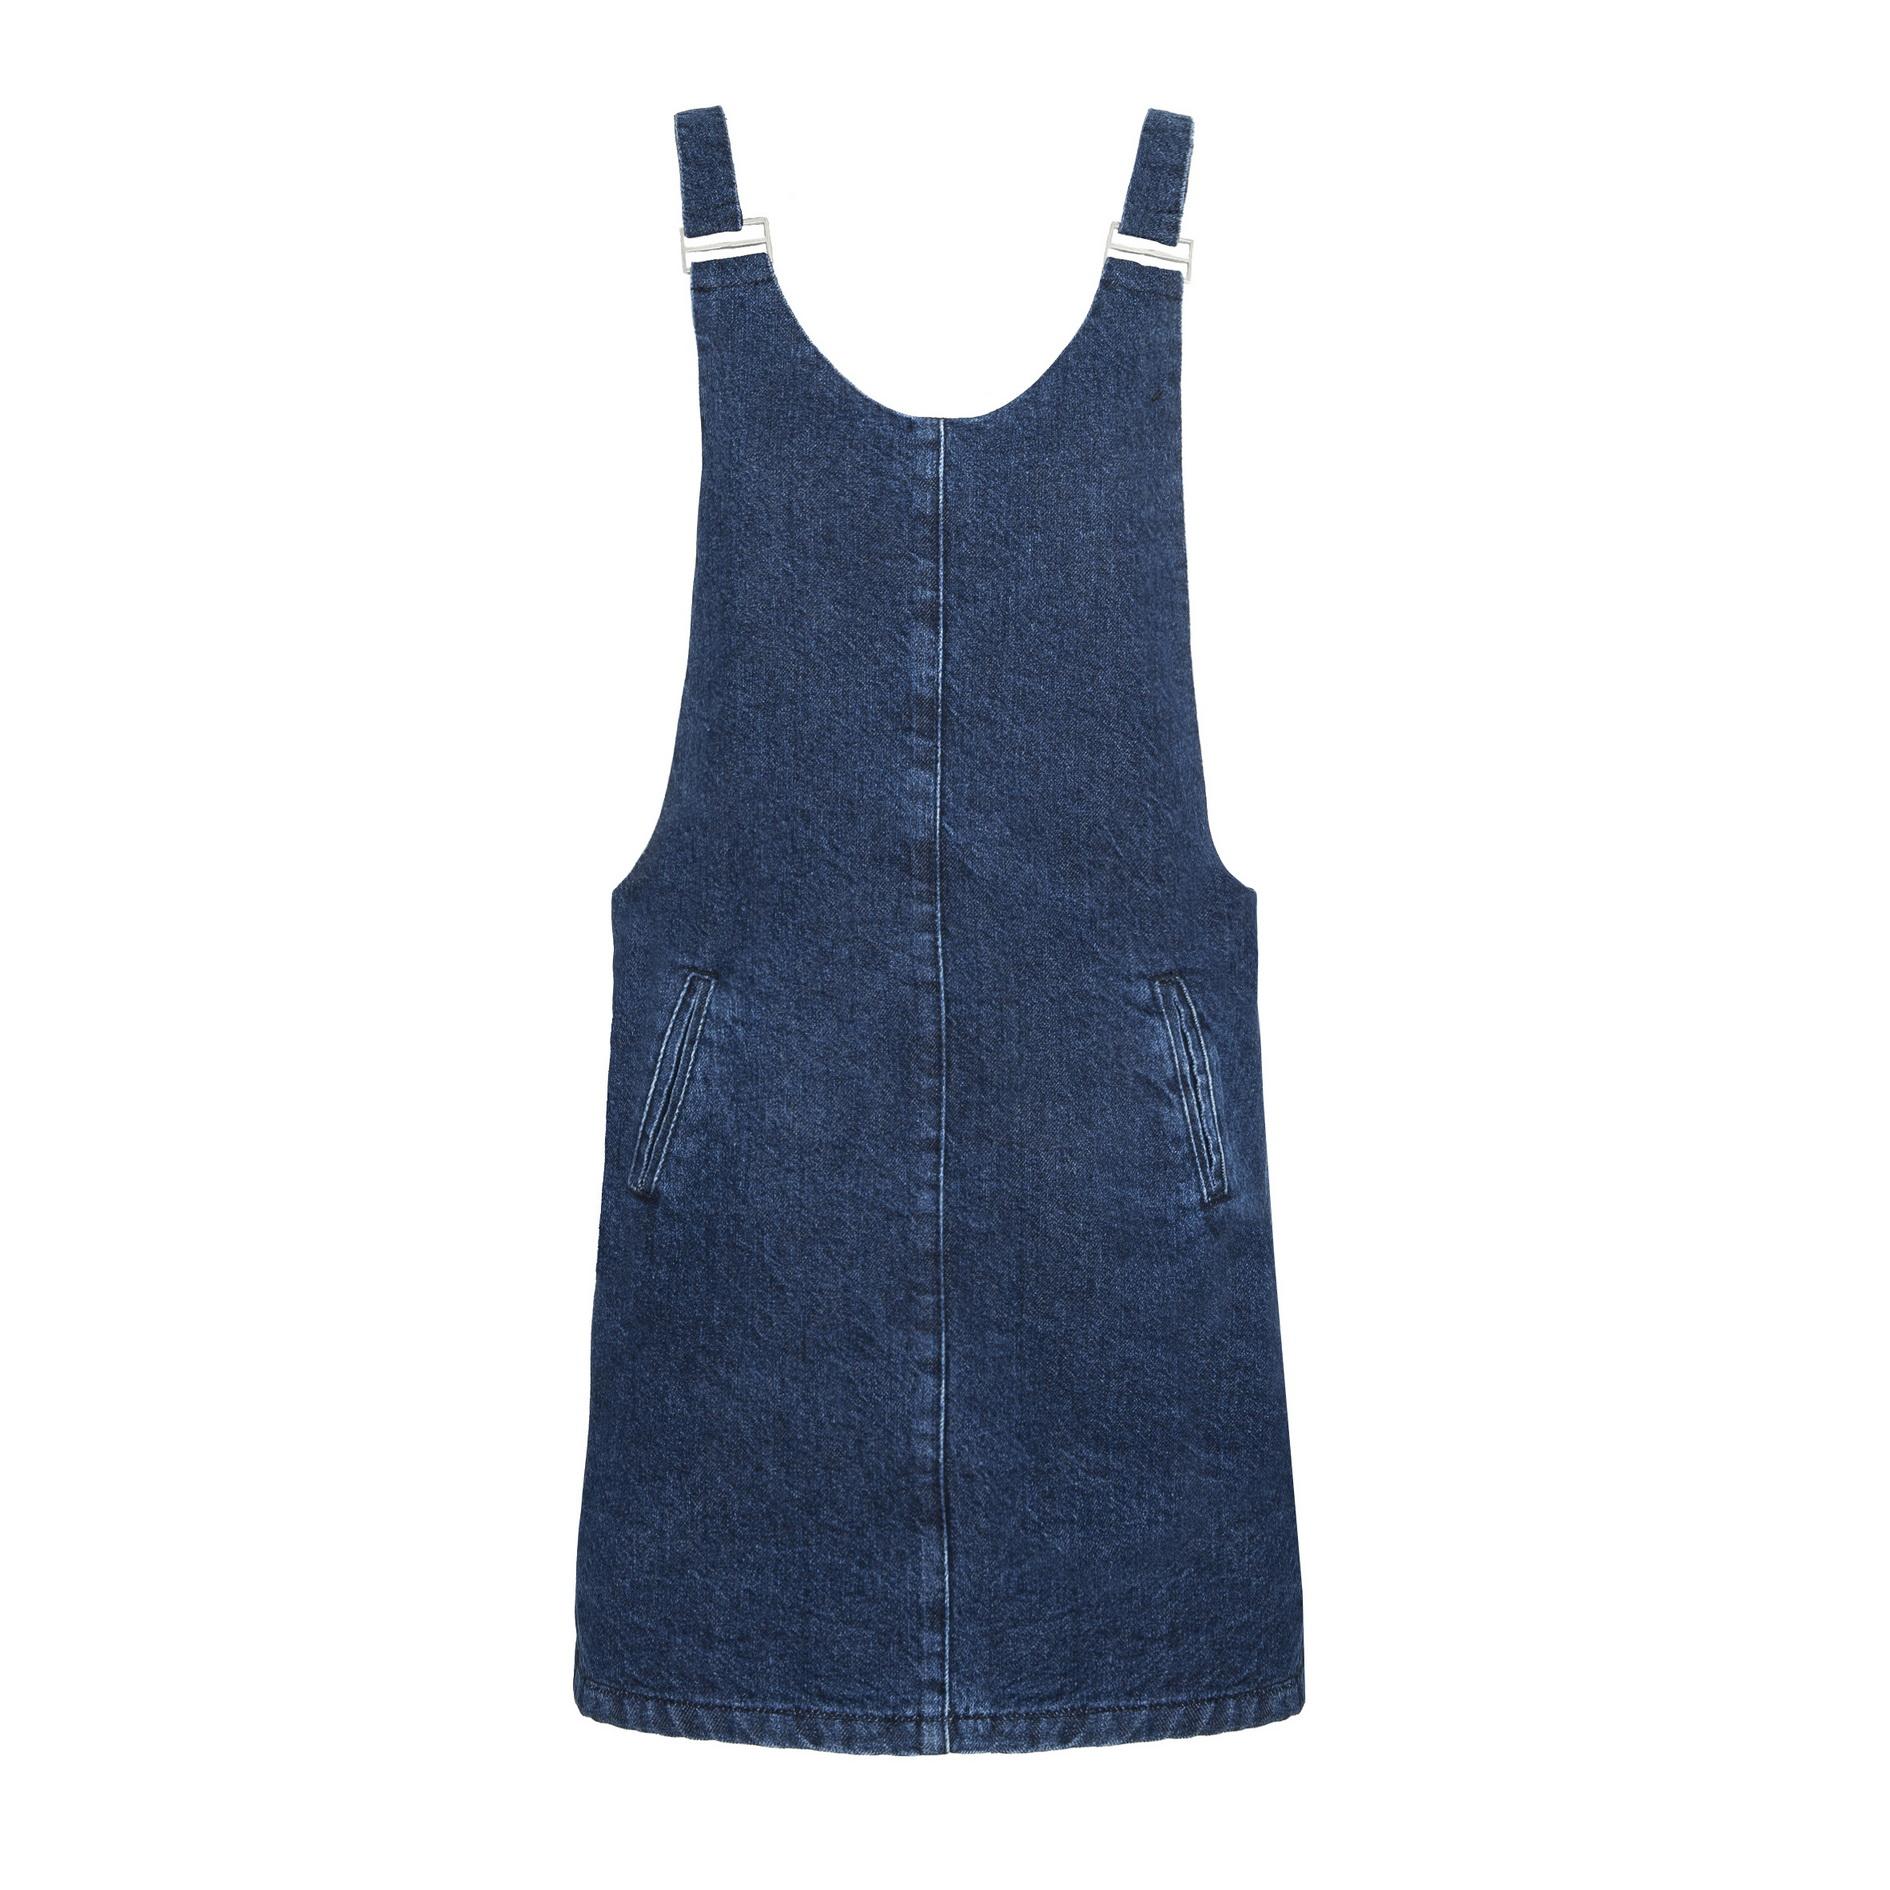 "PULL AND BEAR שמלת ג'ינס קלילה 170 ש""ח"